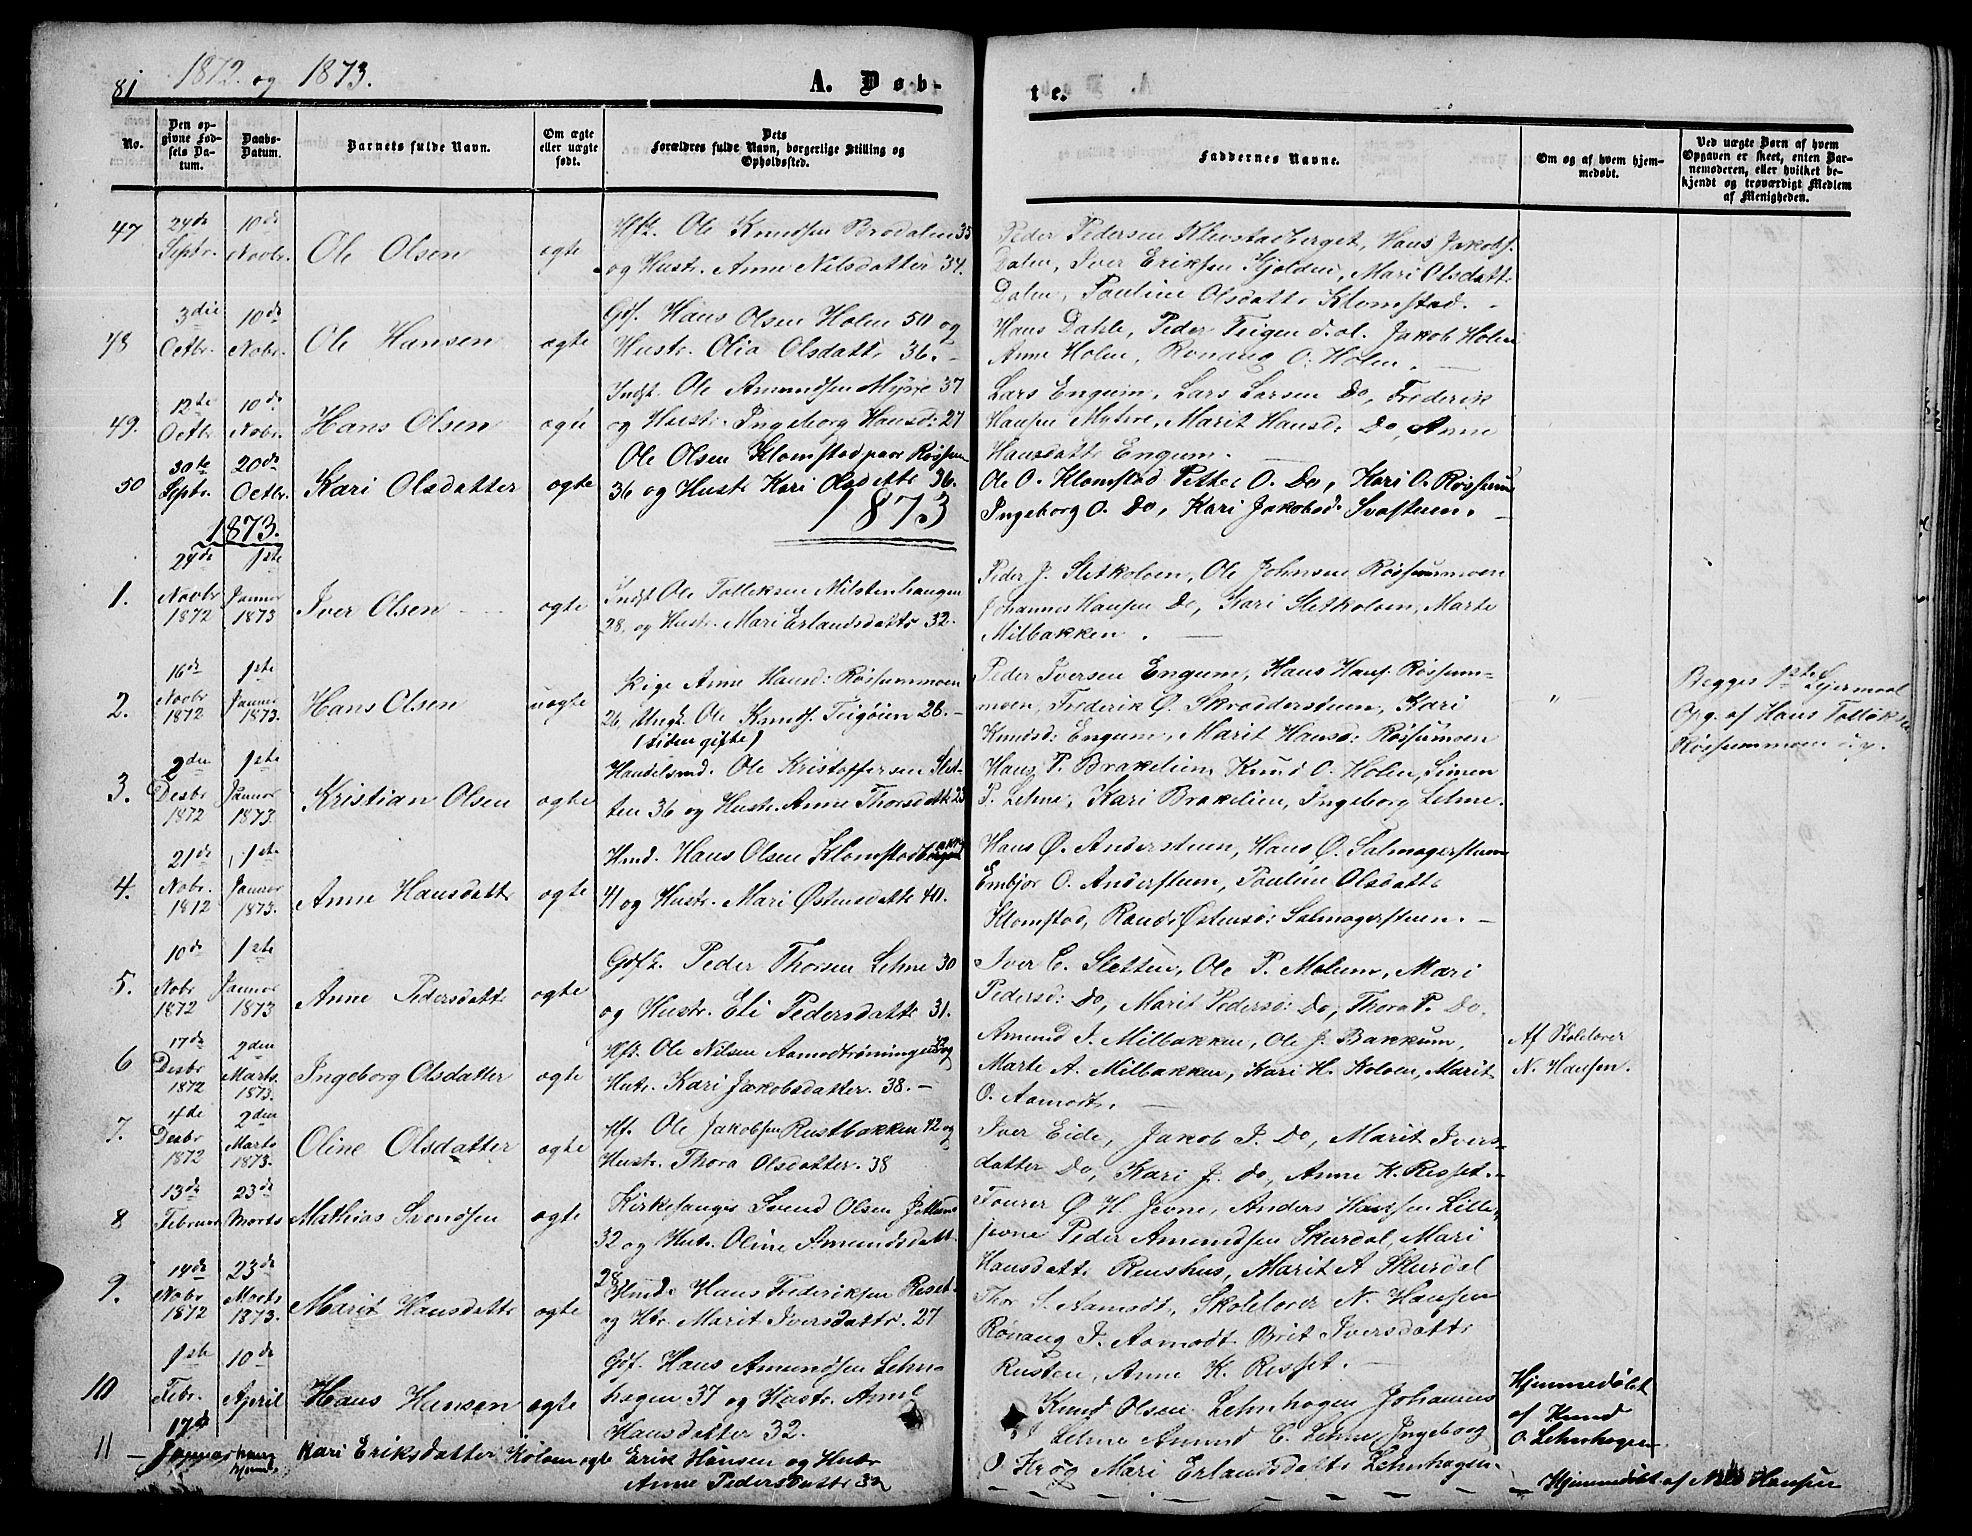 SAH, Nord-Fron prestekontor, Klokkerbok nr. 3, 1851-1886, s. 81